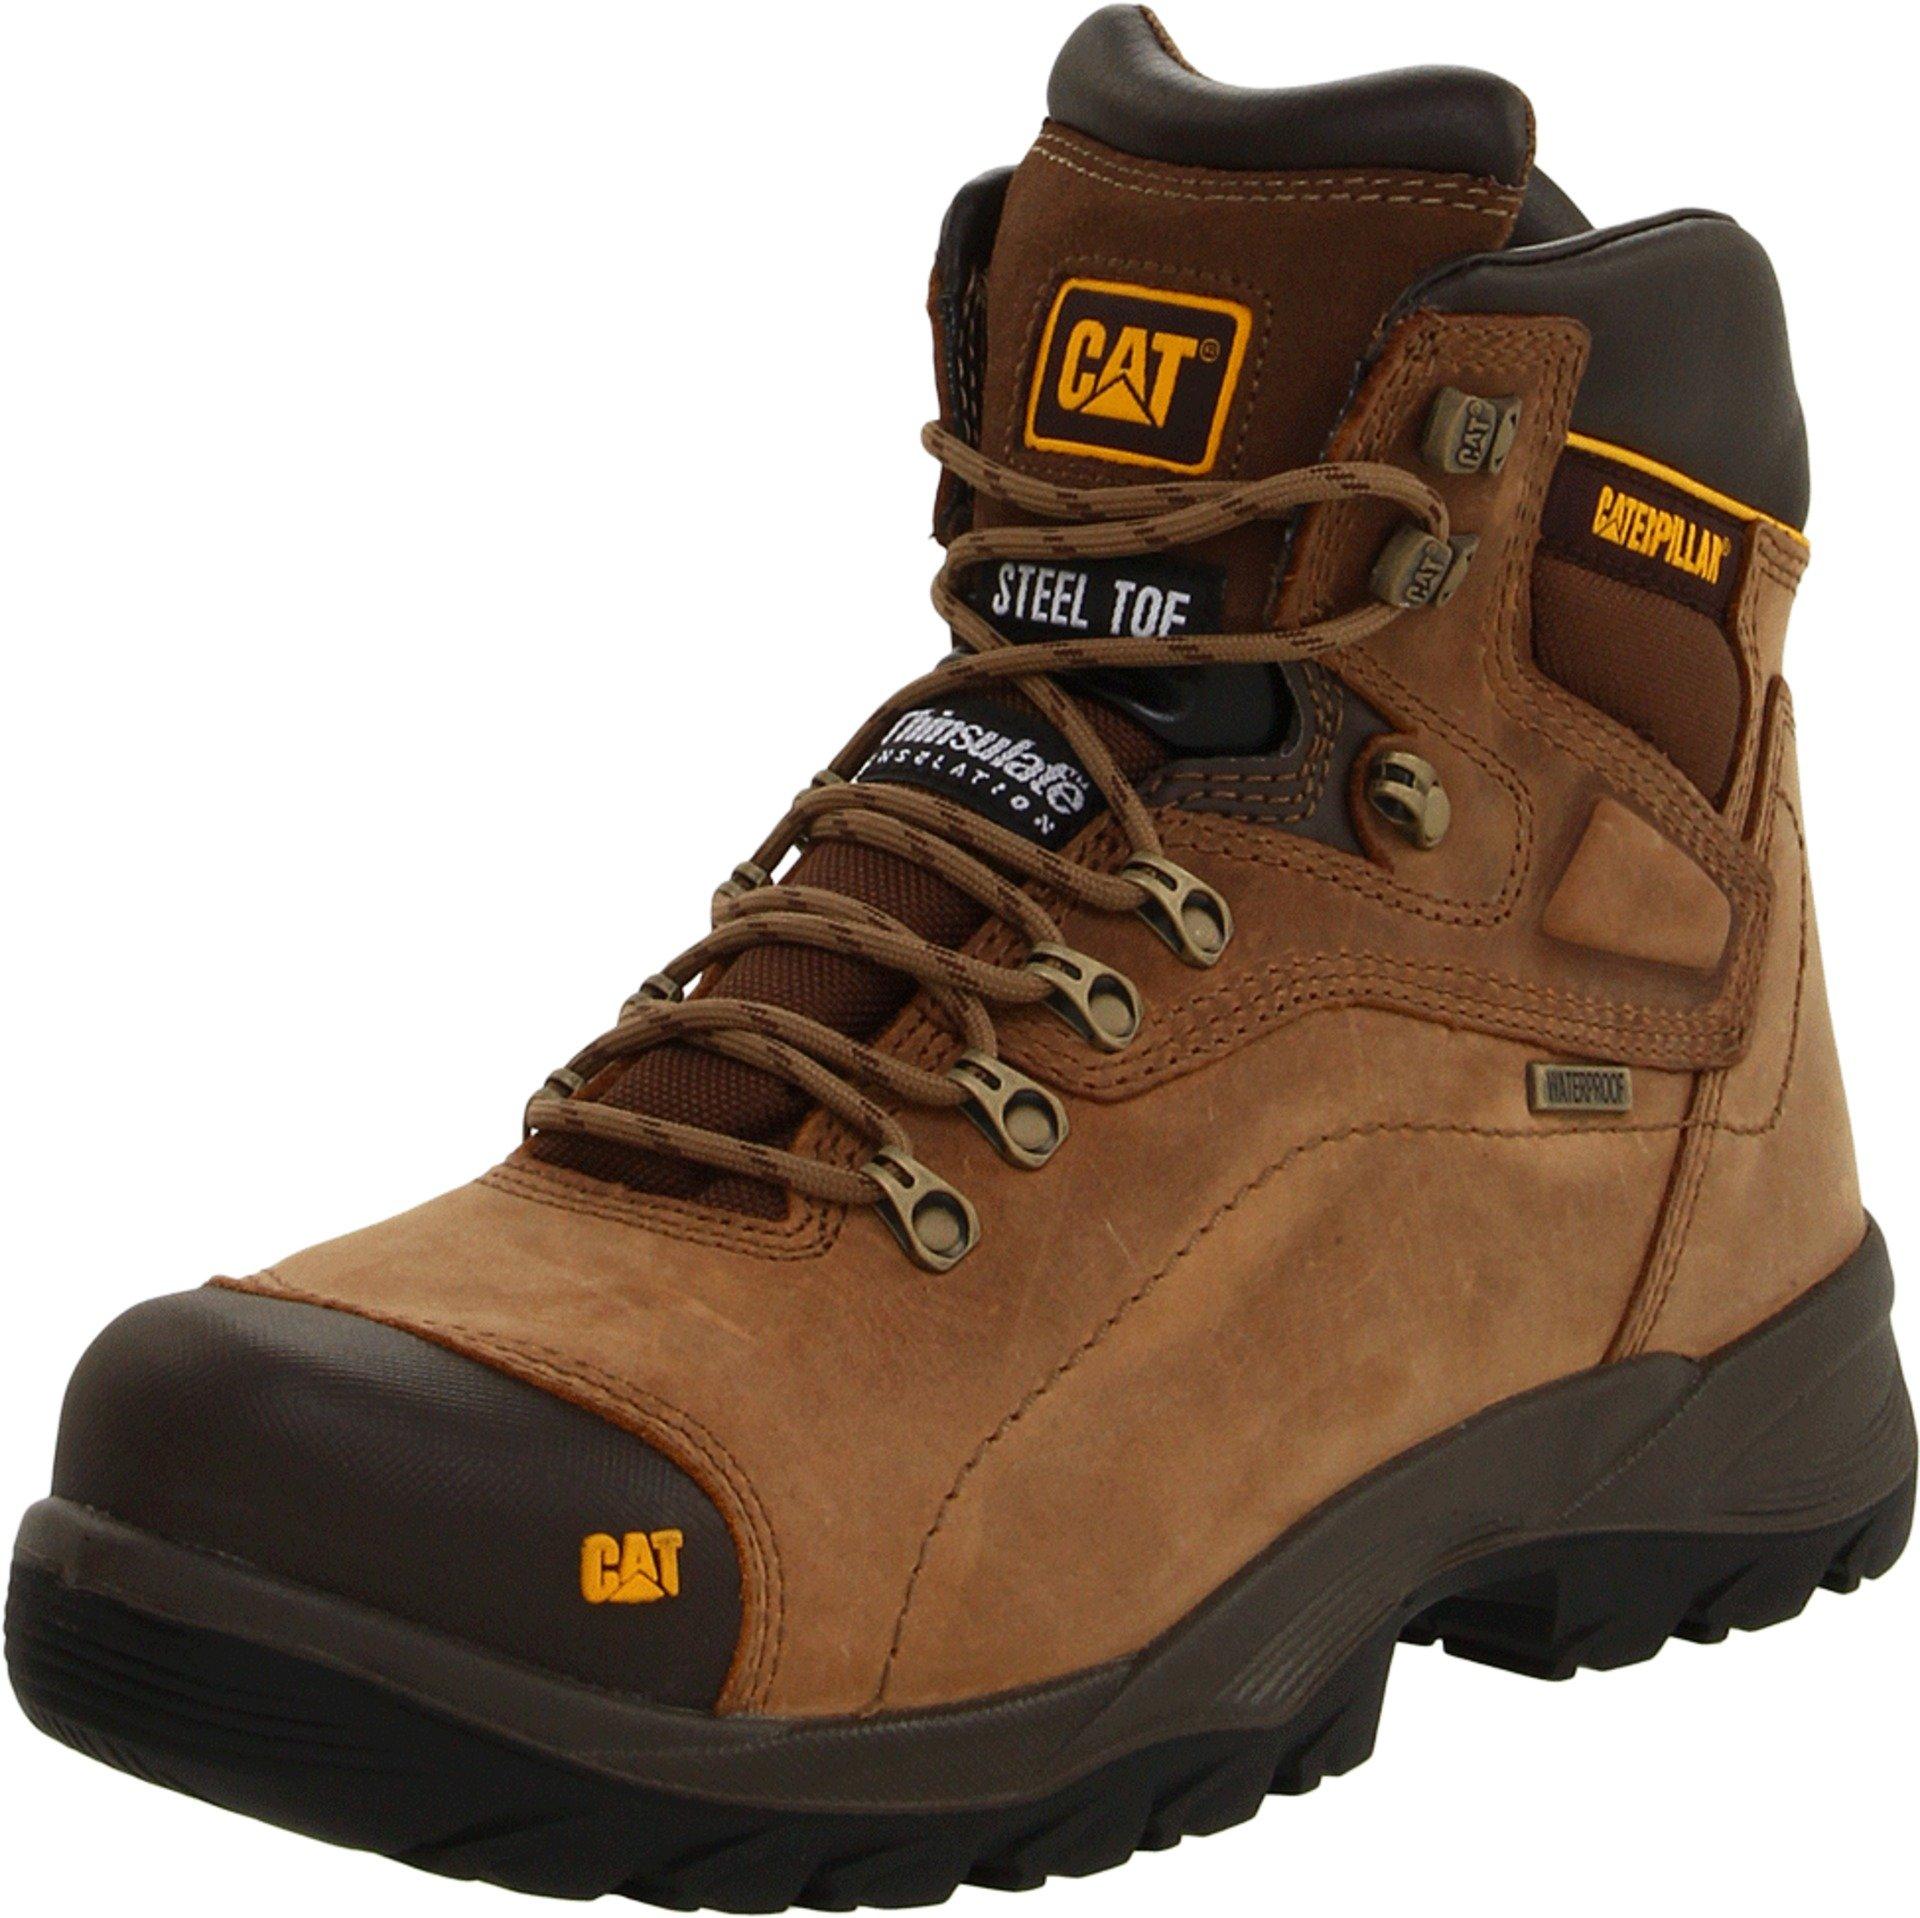 Caterpillar Men's Diagnostic Steel-Toe Waterproof Boot,Dark Beige,7 W US by Caterpillar